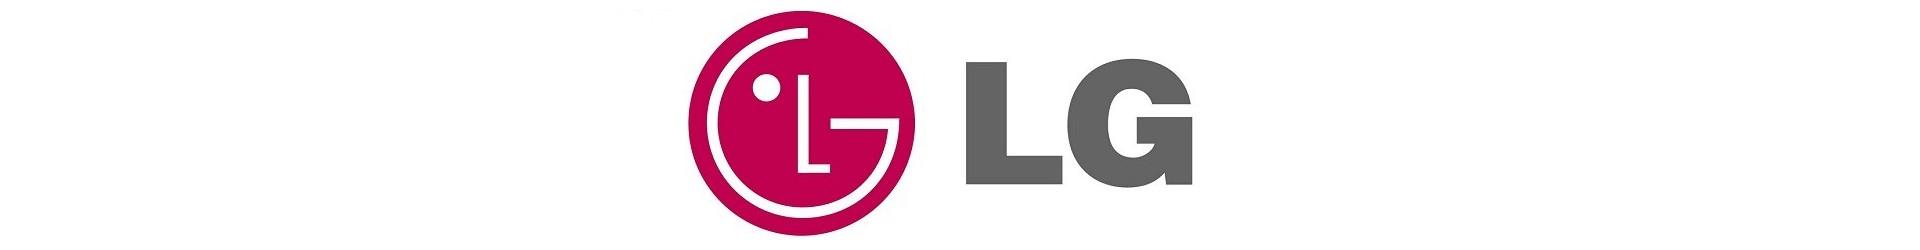 Mono Split LG